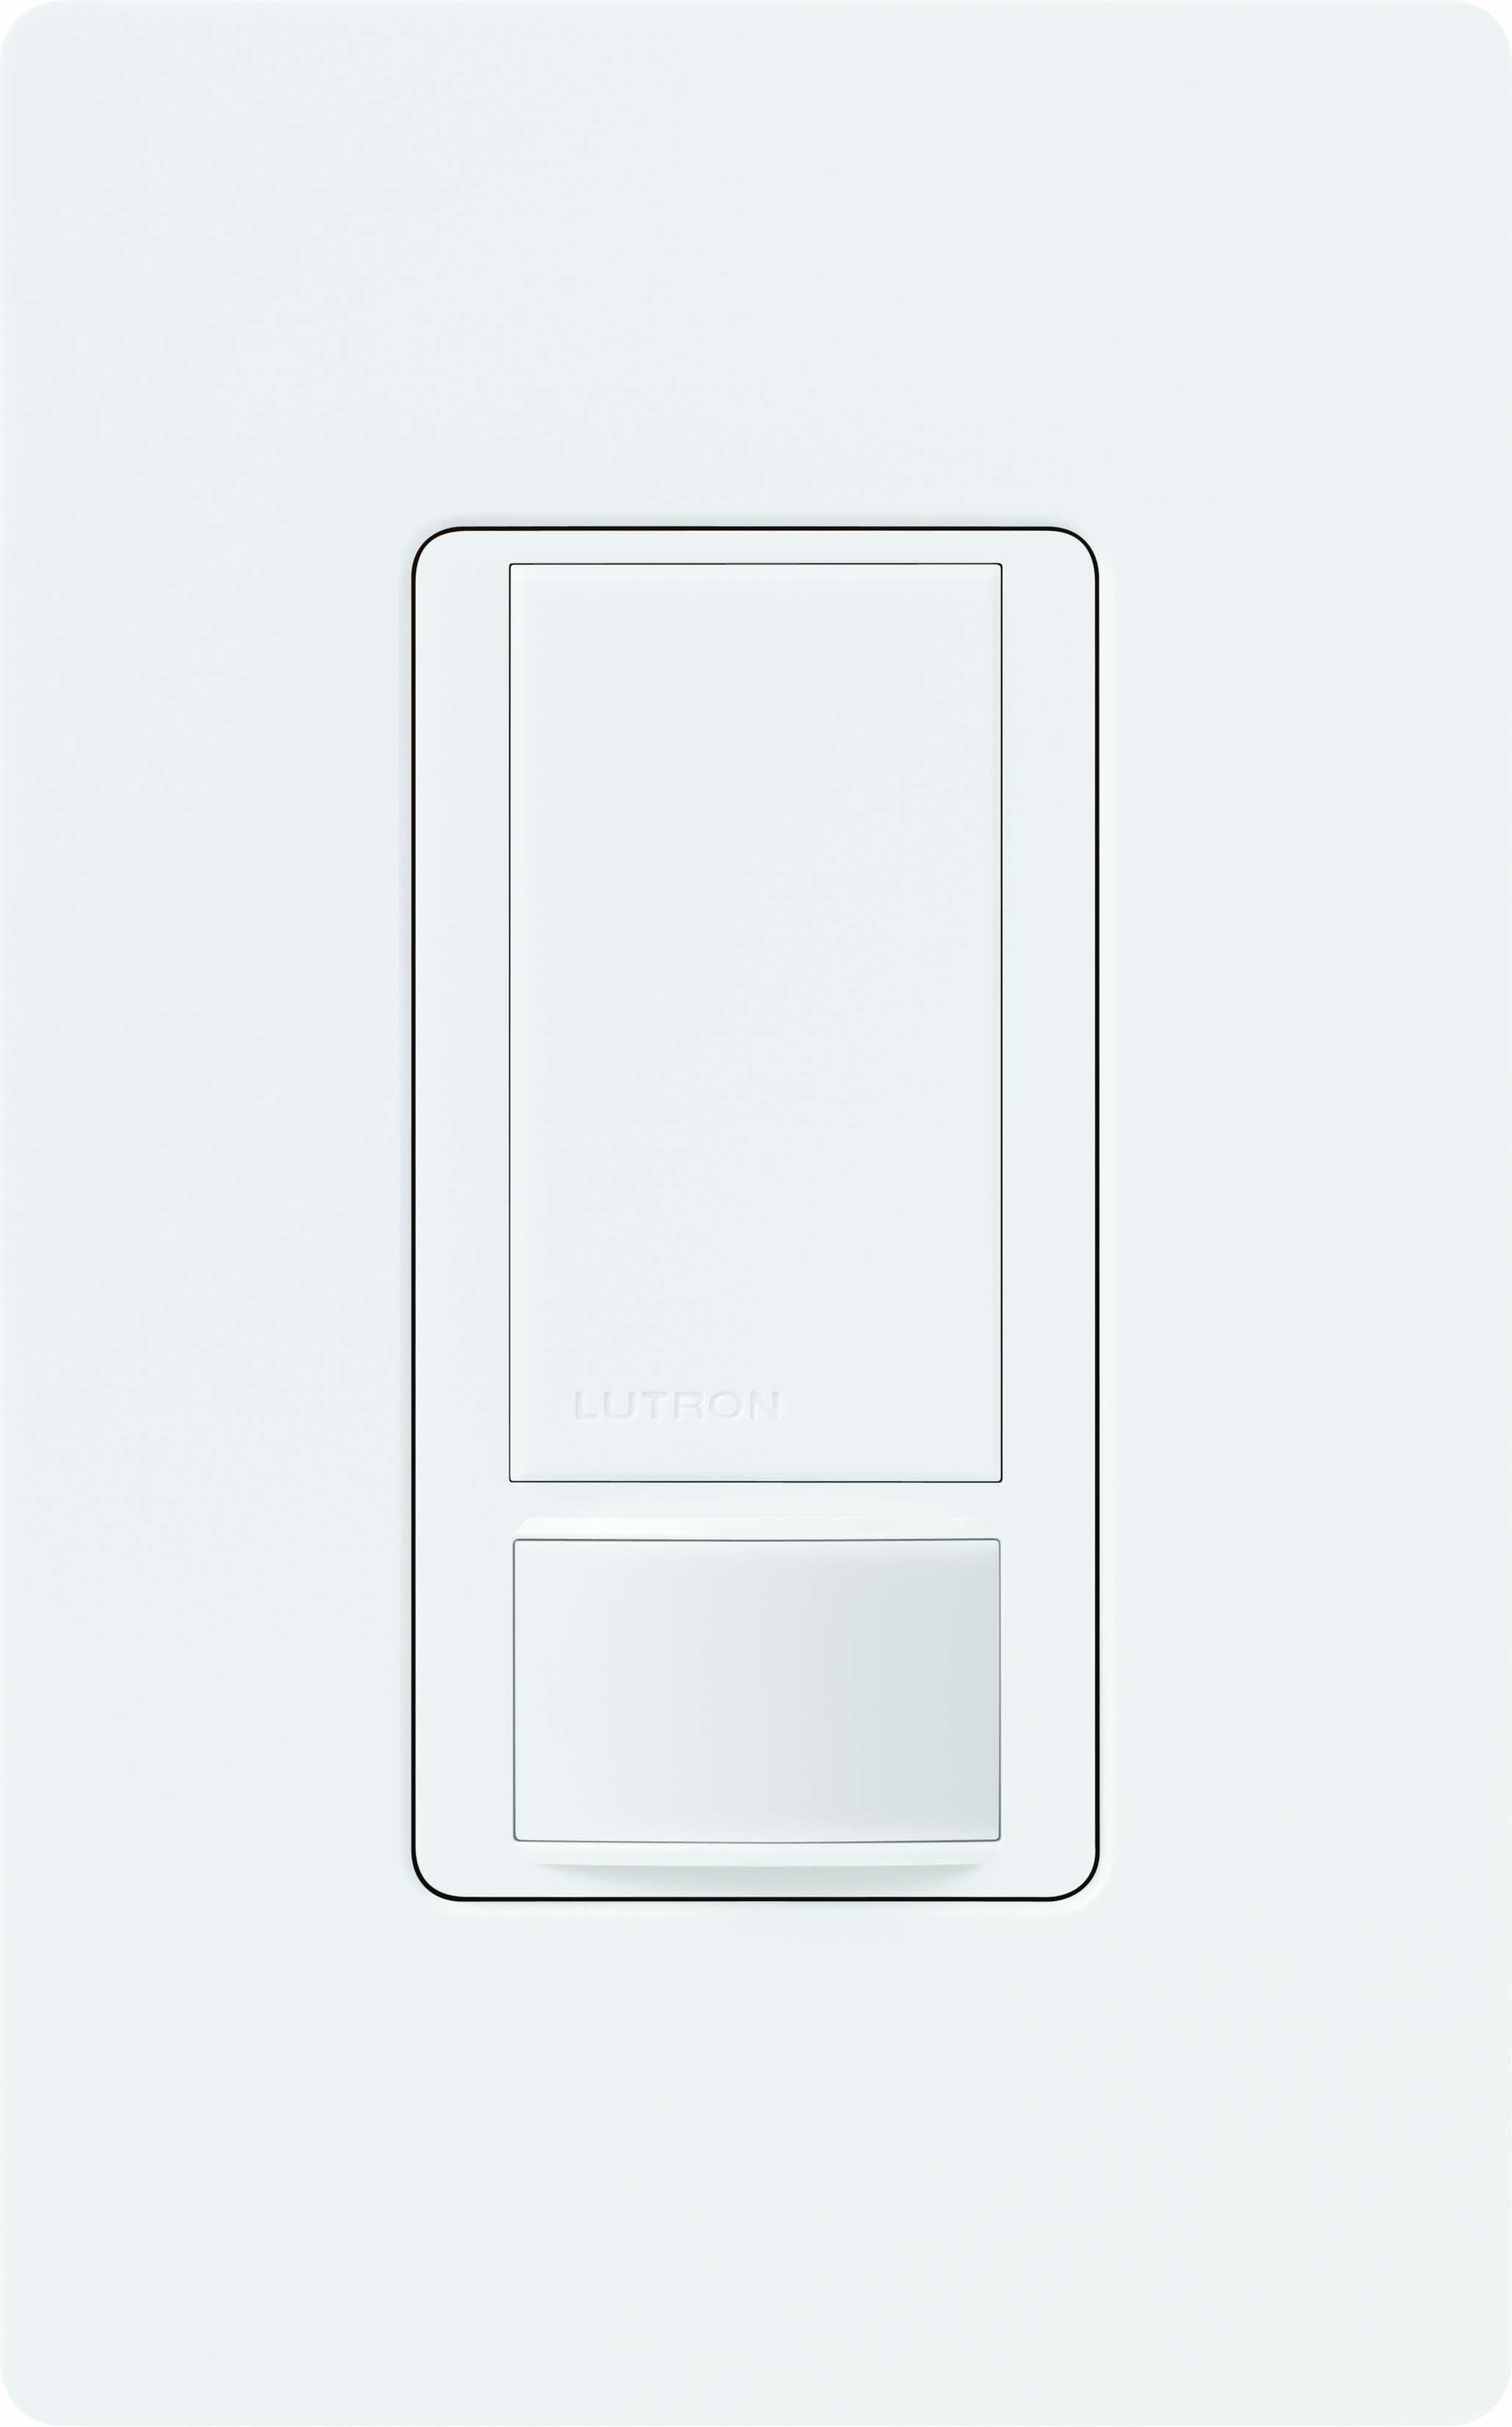 Lutron,MS-OPS2-WH,Maestro® MS-OPS2-WH Occupancy Sensor, 120/277 VAC, PIR Sensor, 30 x 30 ft Coverage, 180 deg